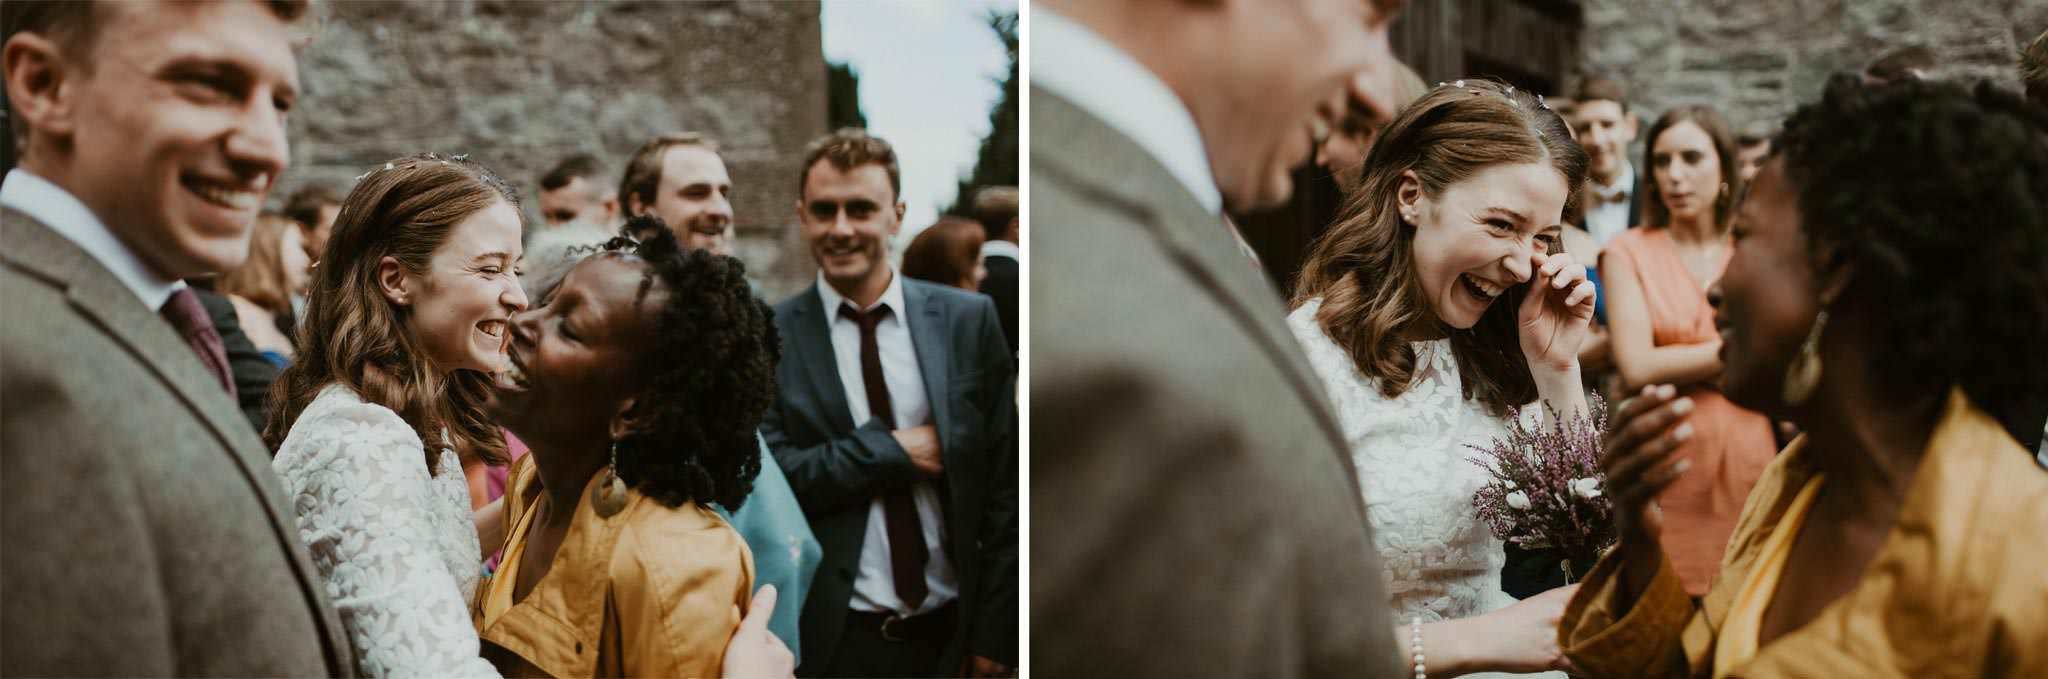 scotland-wedding-photographer-102